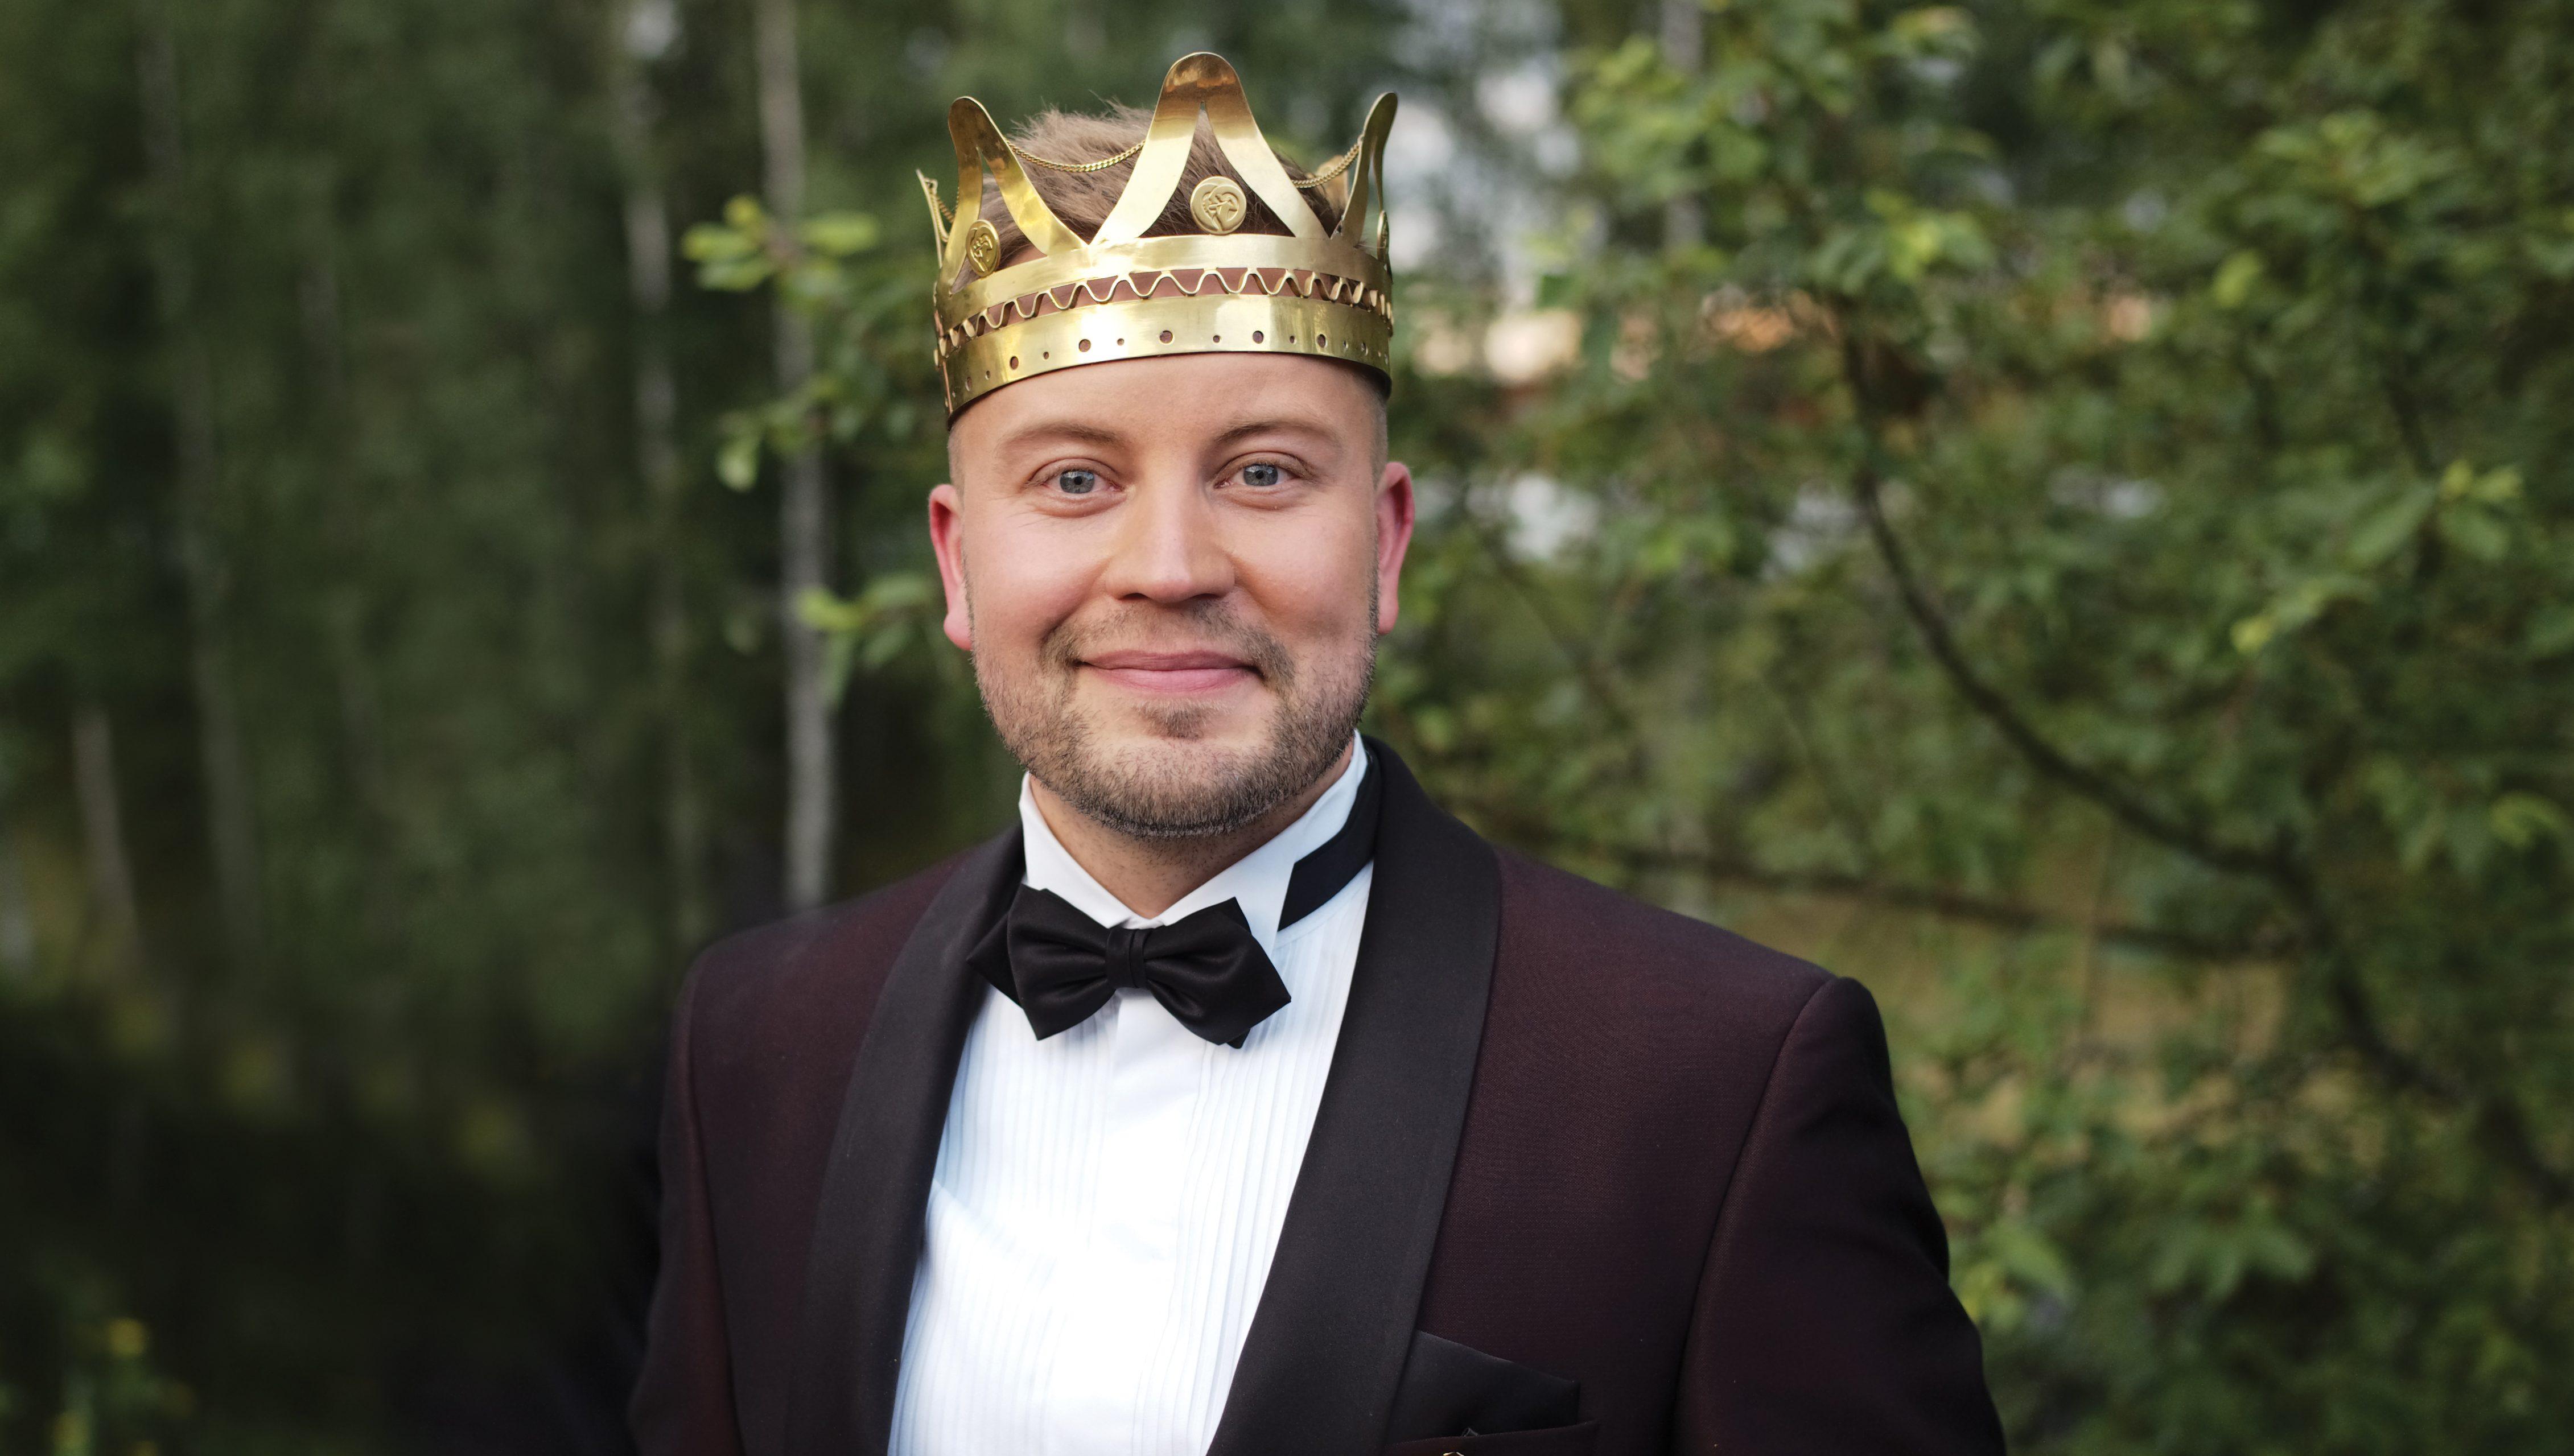 Jarno Kokko